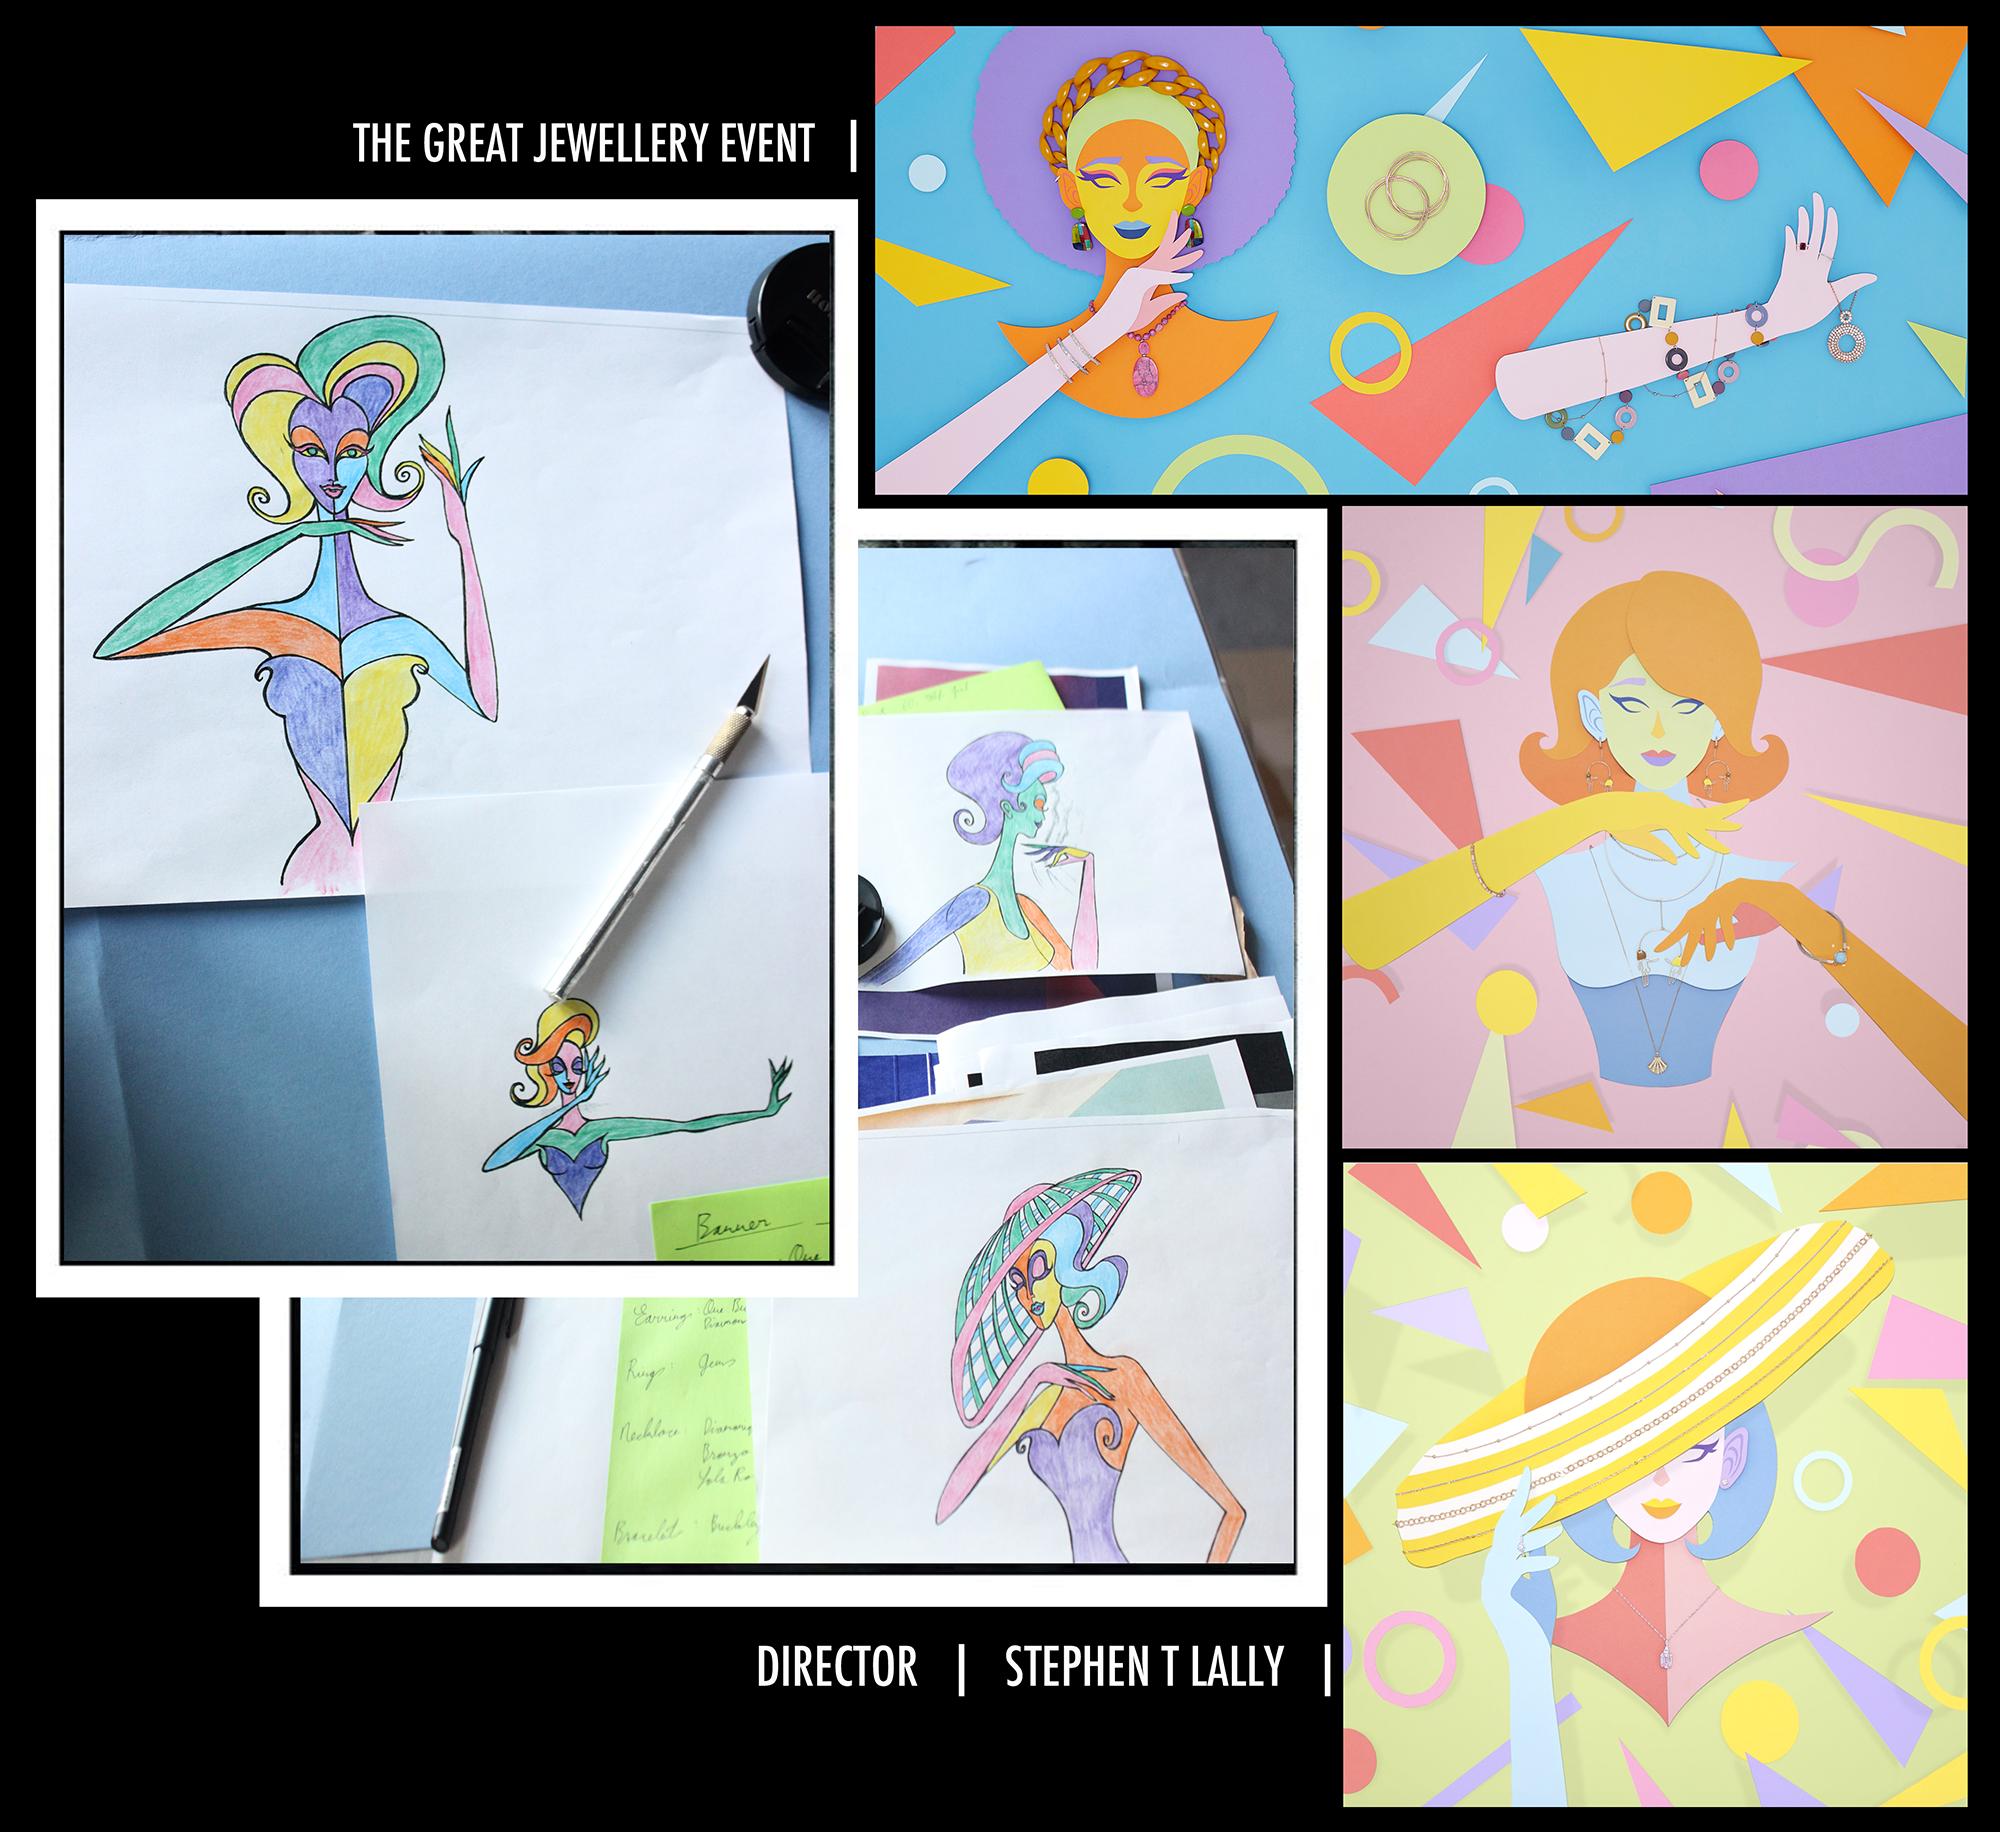 stephen_lally_storyboard_artwork_08.png